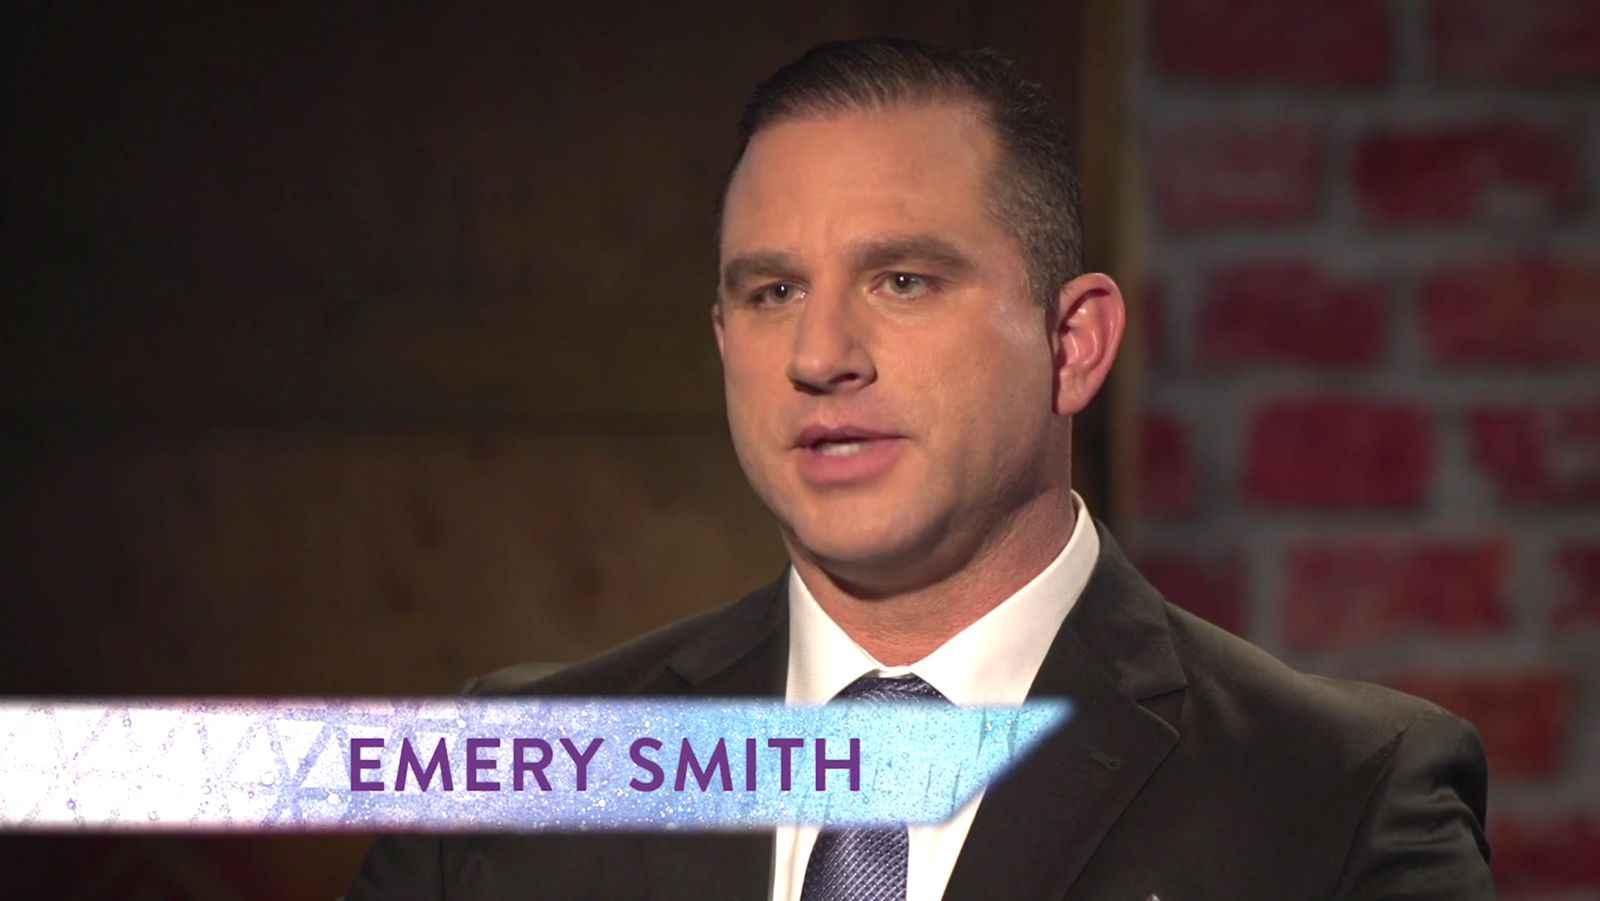 1 Emery Smith 2